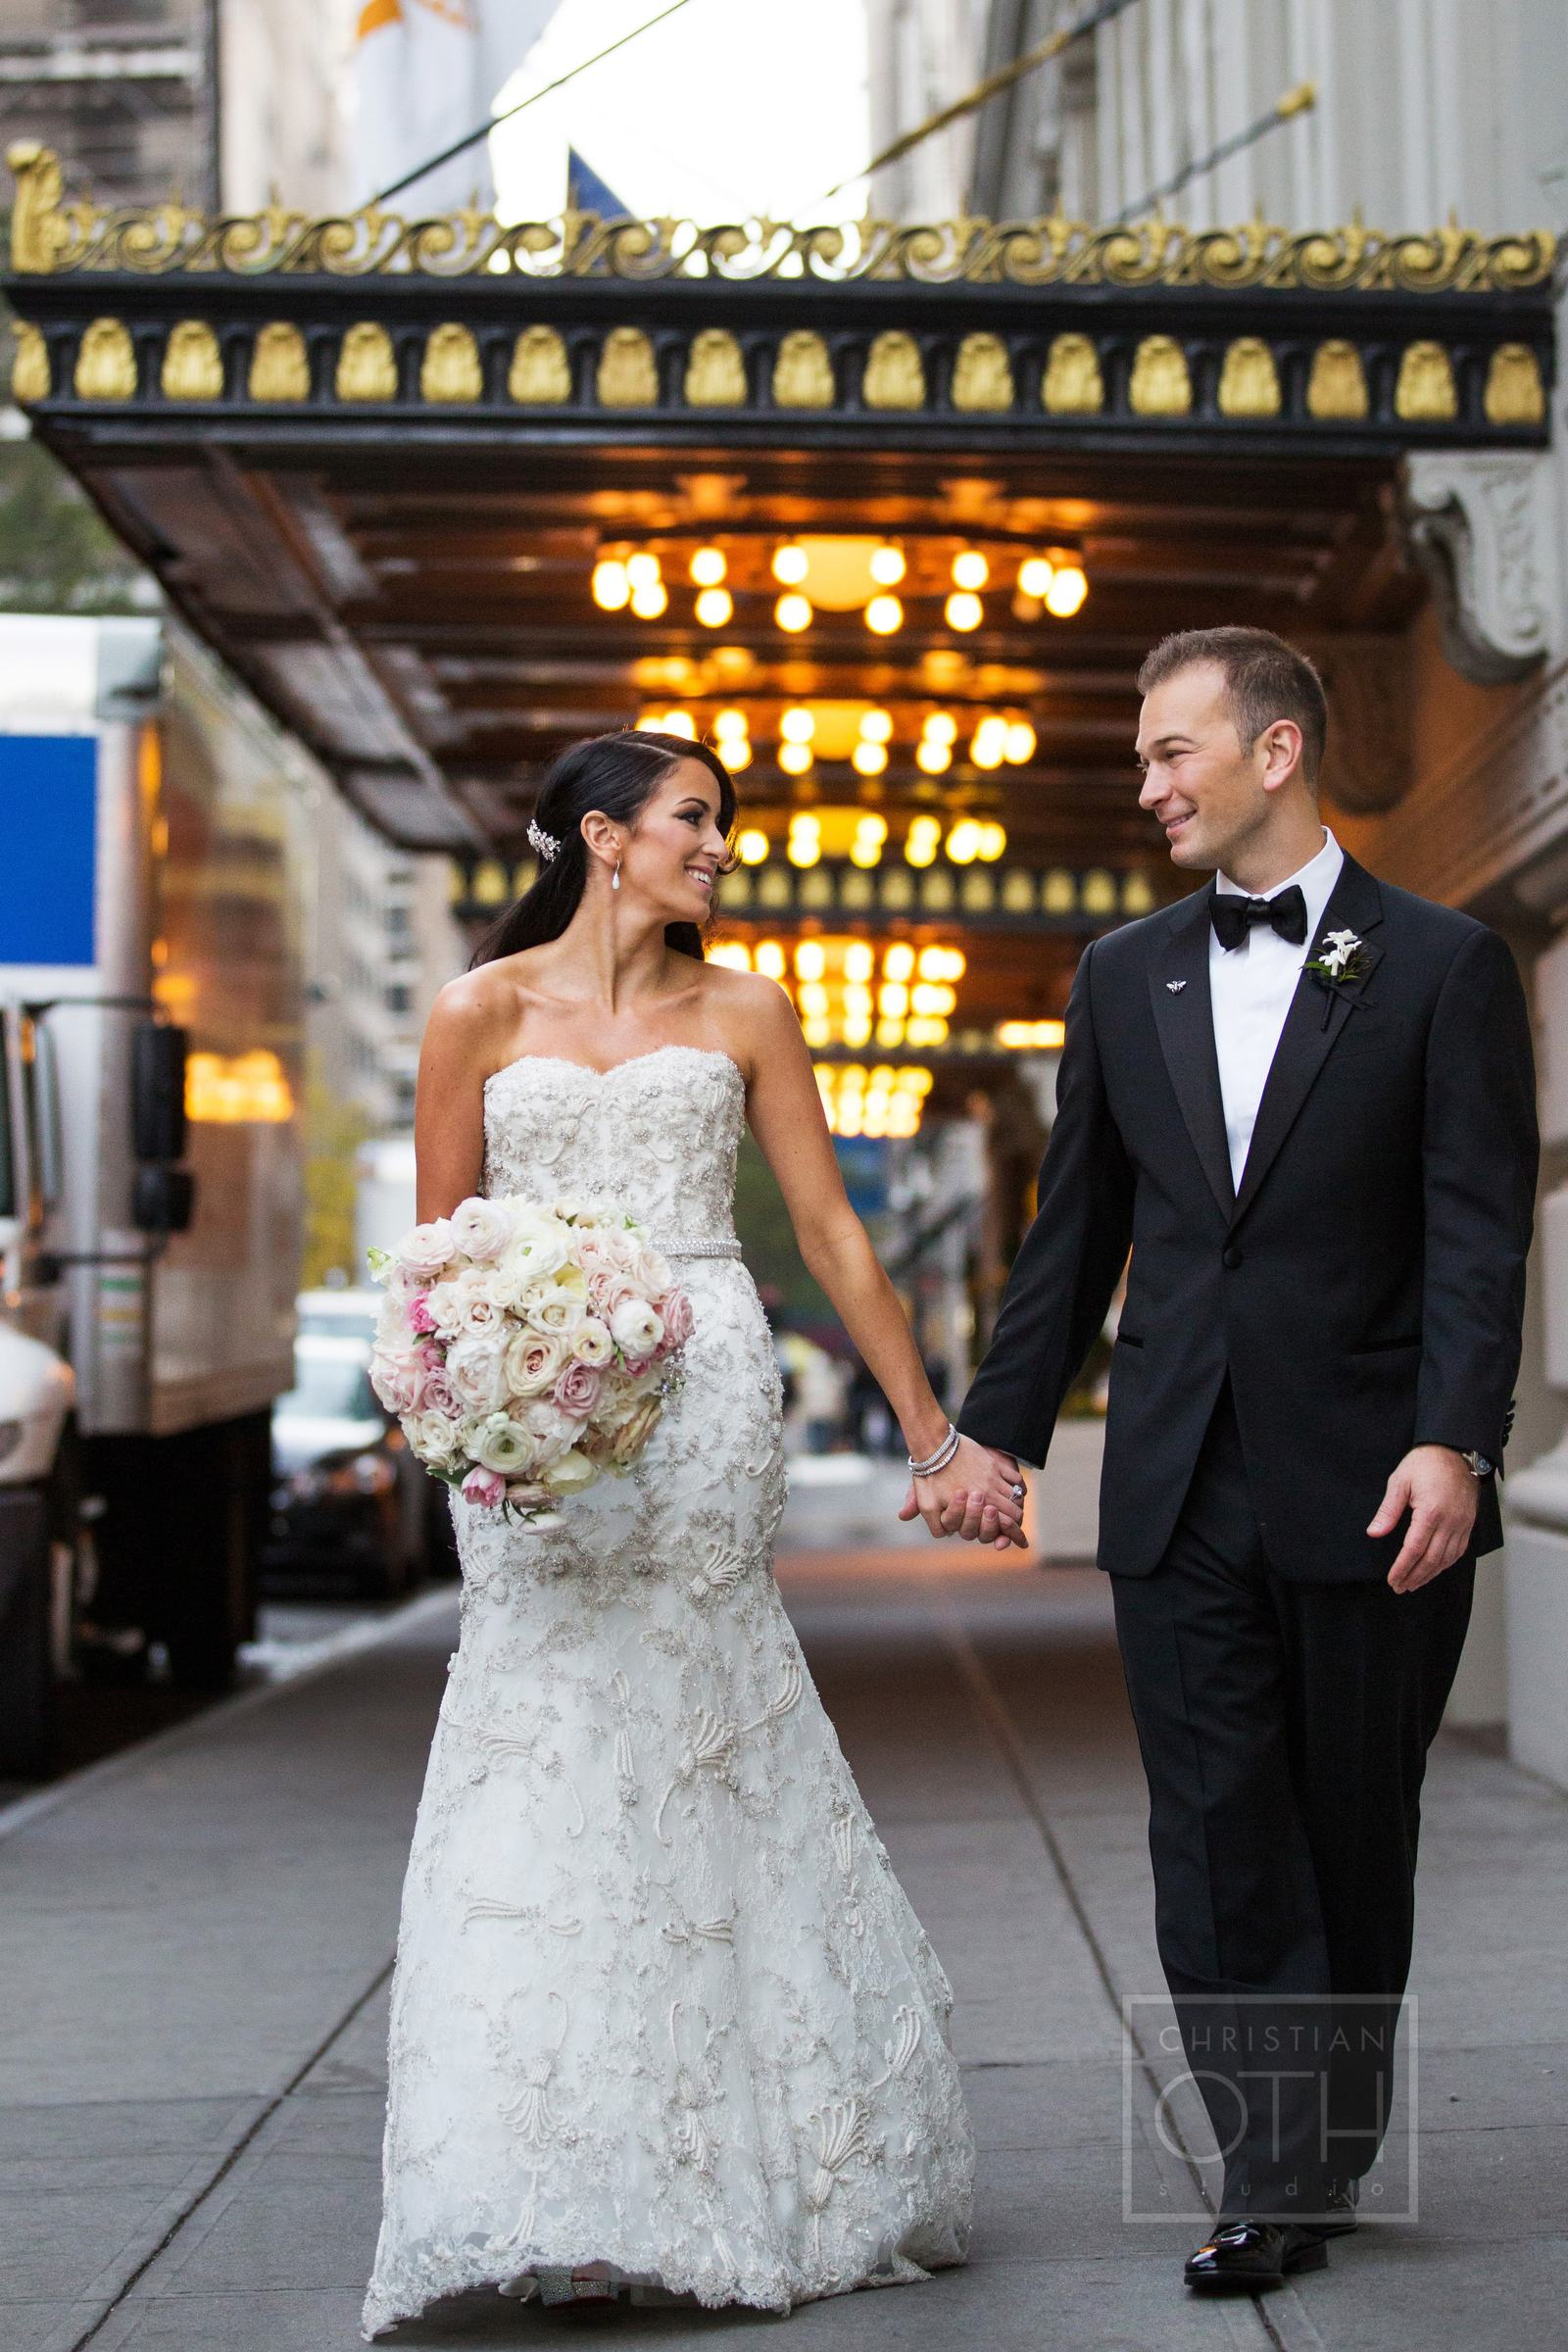 Ceci_New_York_Custom_Invitation_Pierre__City_ Destination_Wedding_Luxury_Personalized_Ceci_Style_Bride_Rose_Gold_Foil_Stamping57.JPG